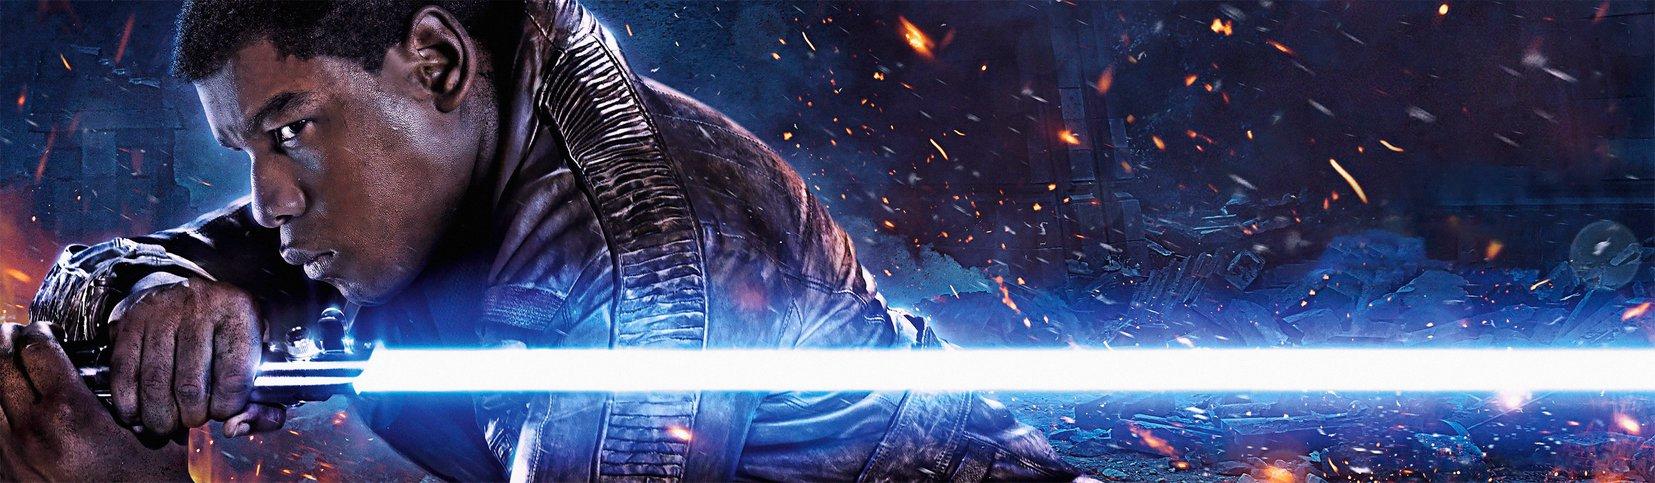 Star Wars Finn Banner [Hi Res Textless Wallpaper] by Lightsabered on 1655x483